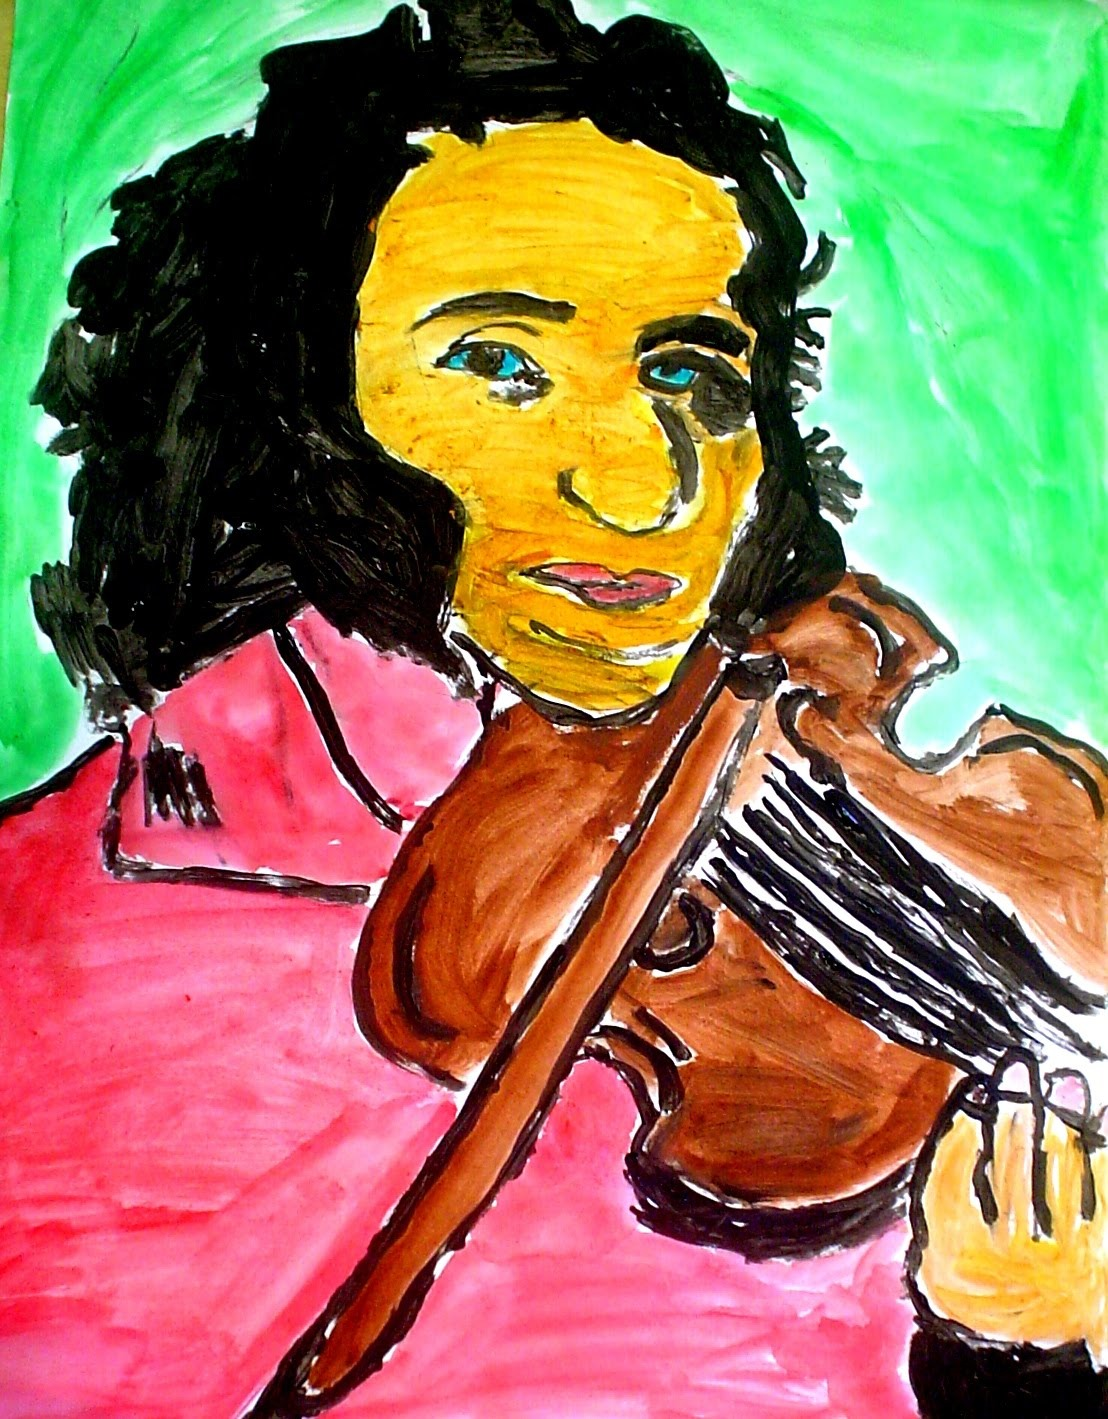 Niccolò Paganini Credit: http://eshelmanartcca.blogspot.hk/